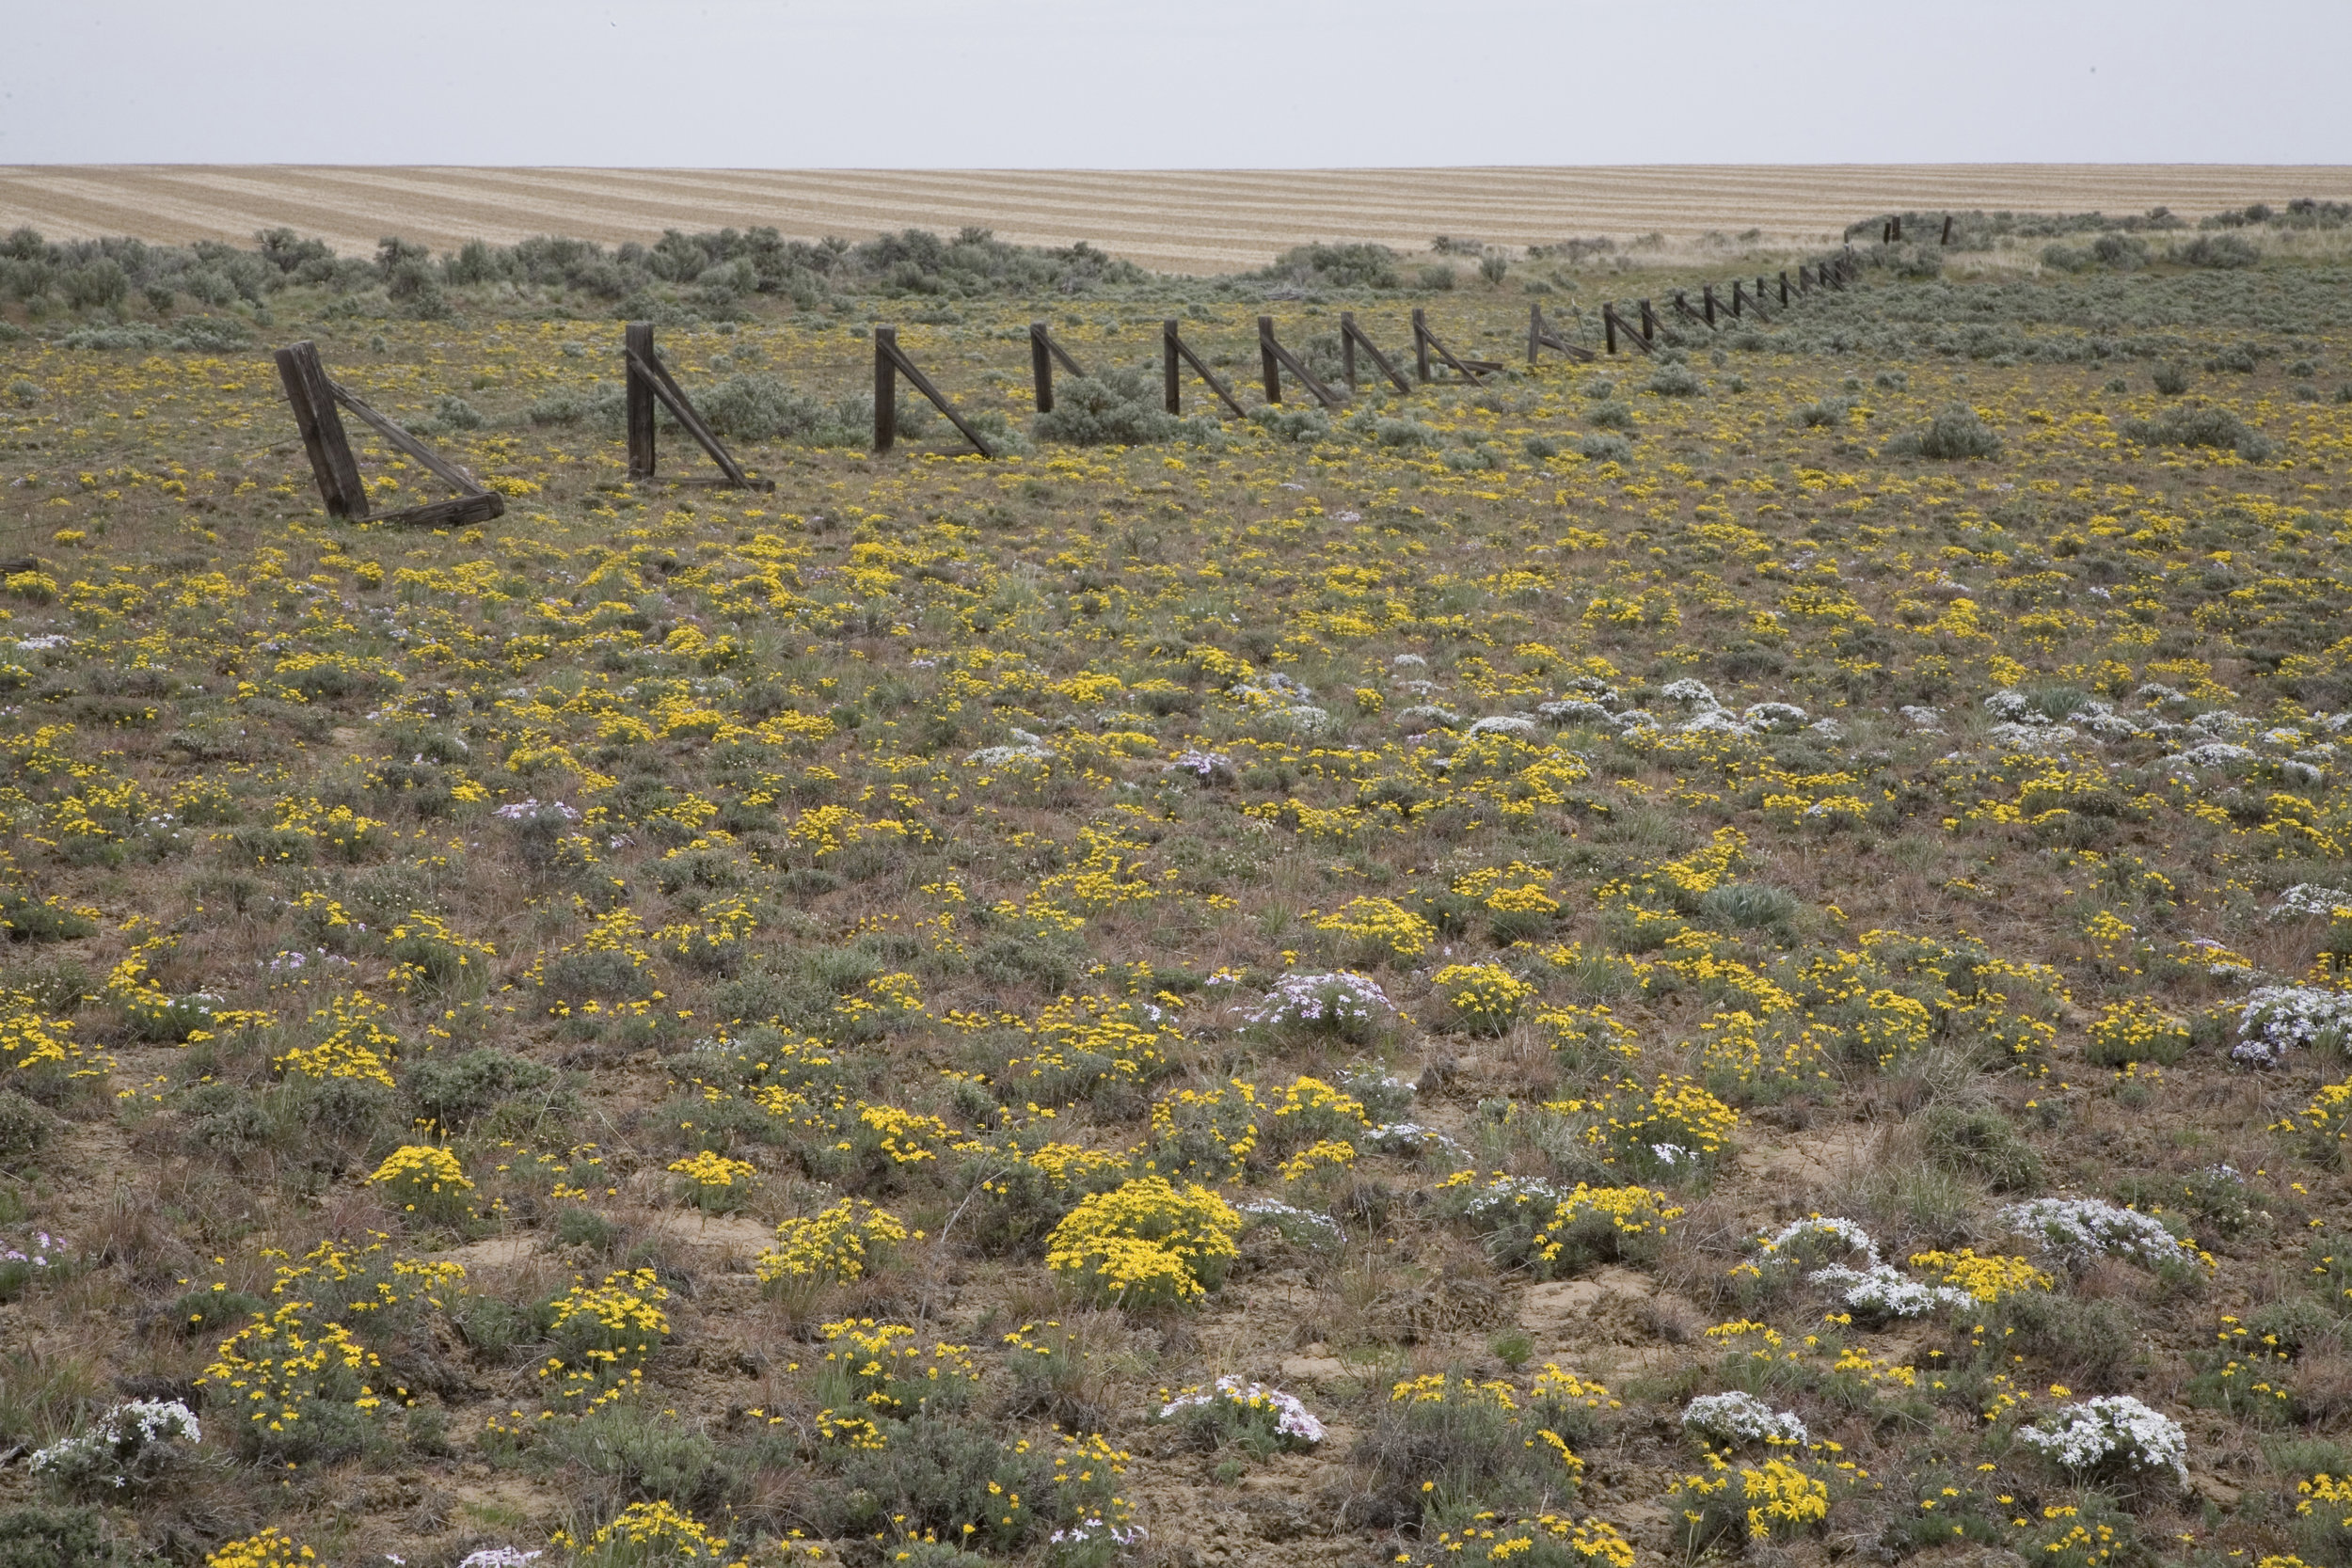 Wildflowers at the Beezley Hills Preserve on Washington's Columbia Plateau. © John Marshall